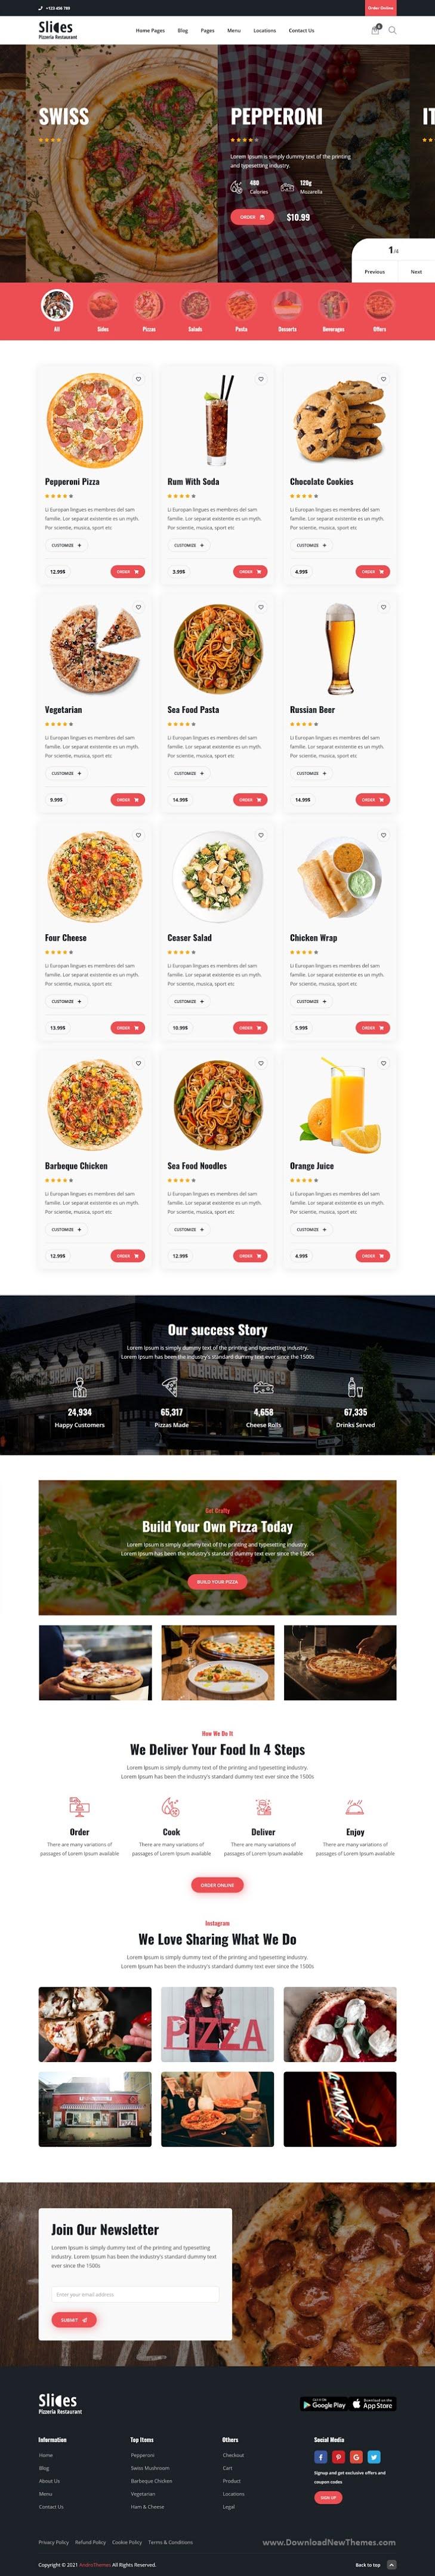 Pizza Restaurant React Template